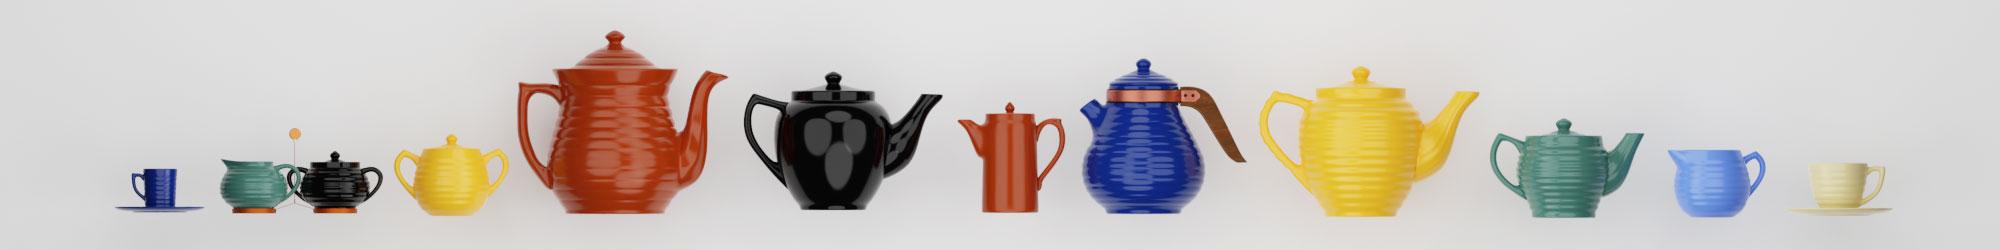 QwkDog 3D Bauer Pottery Teapots Banner